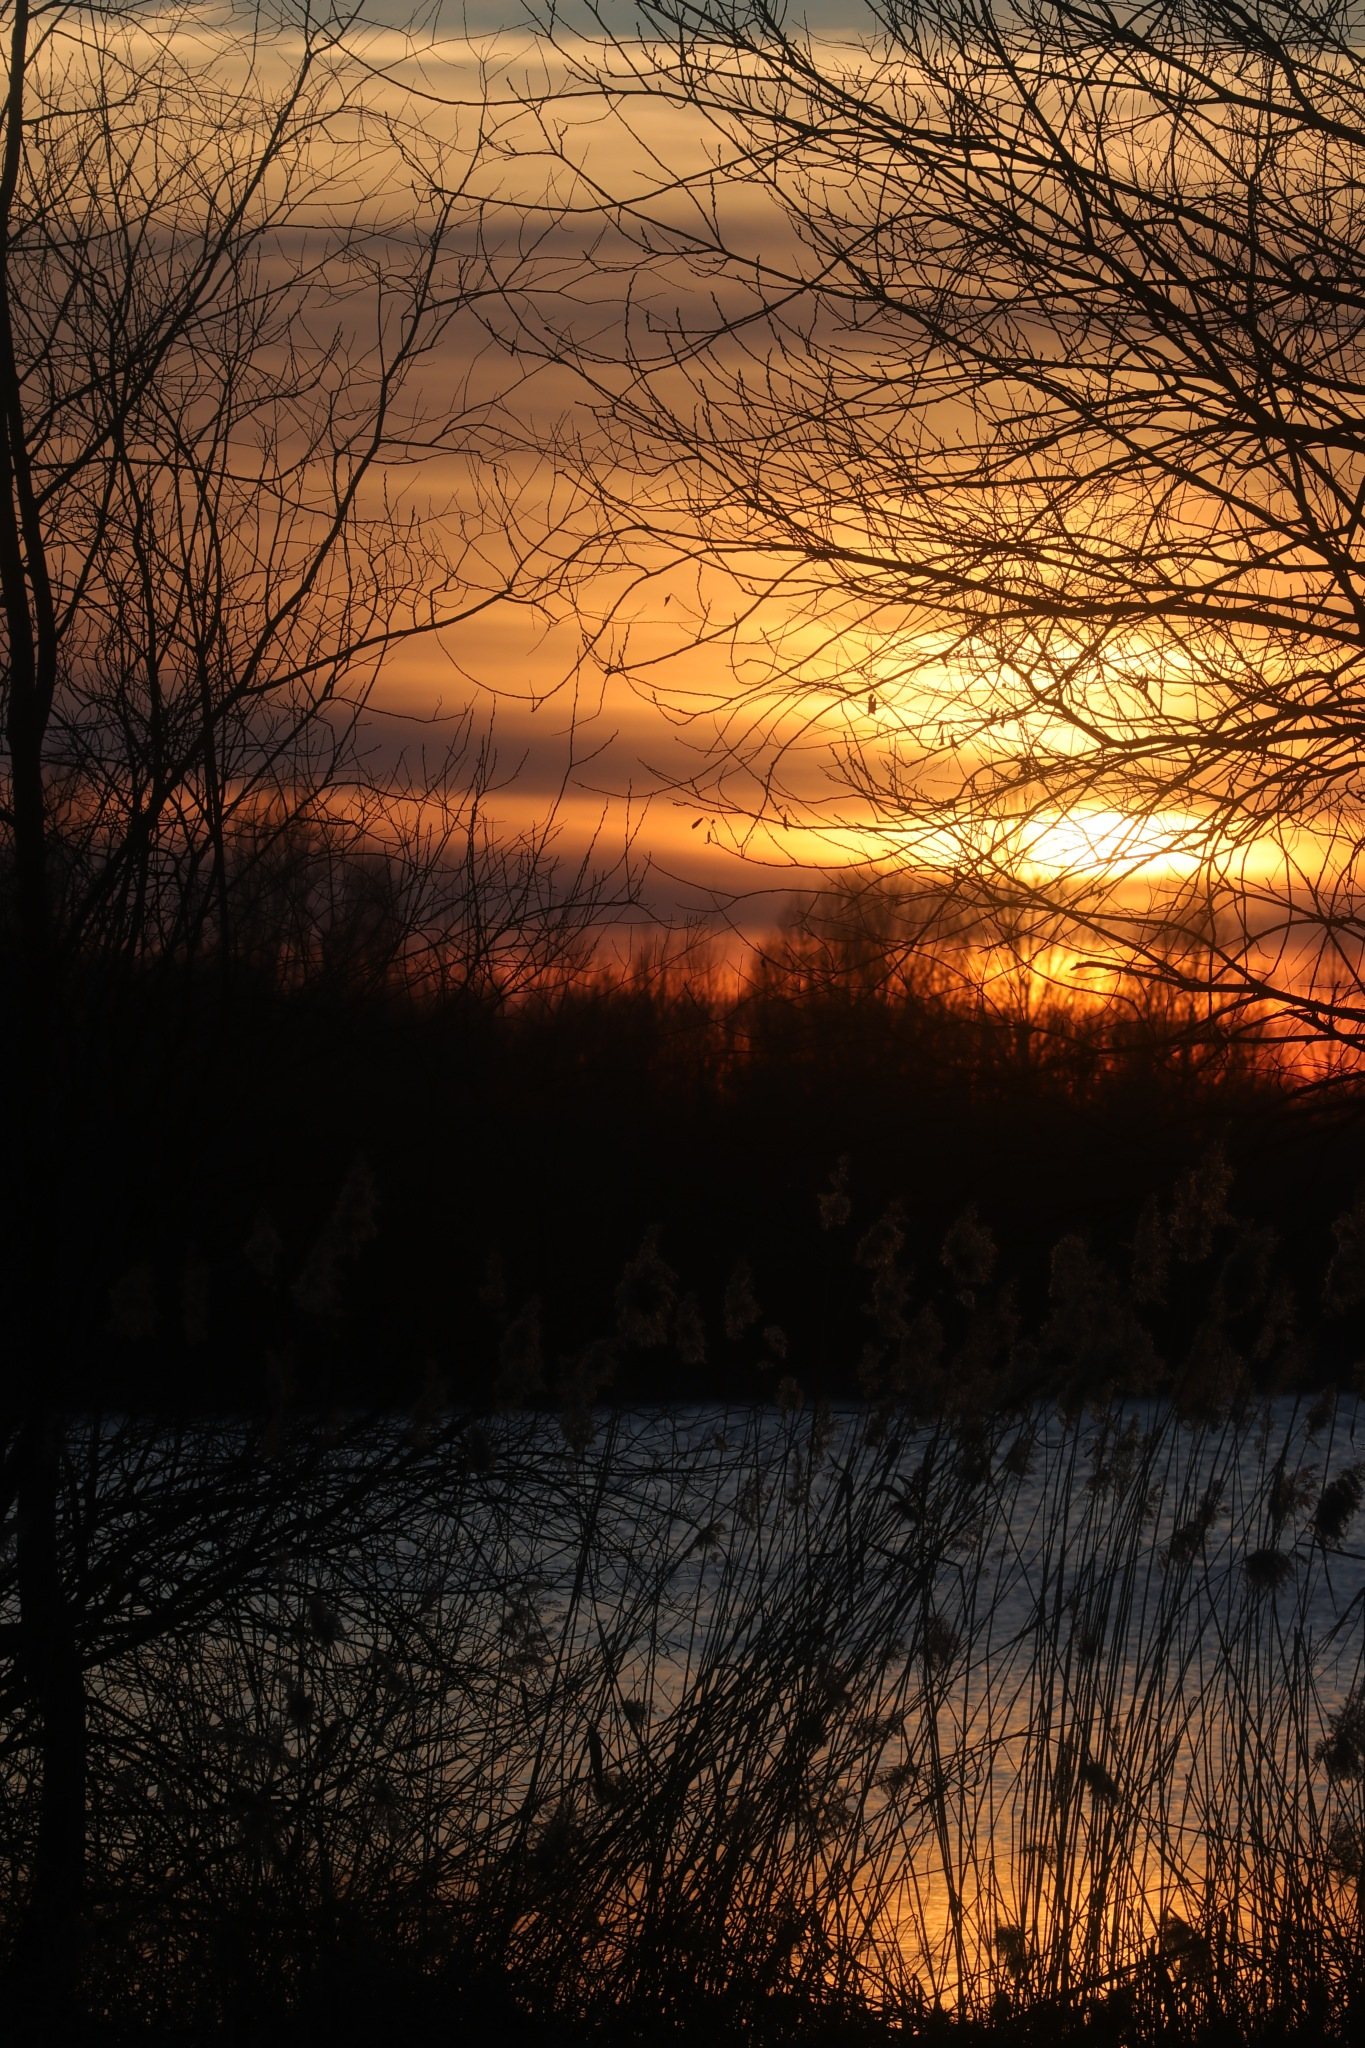 sunset Zem by fons.jonkers